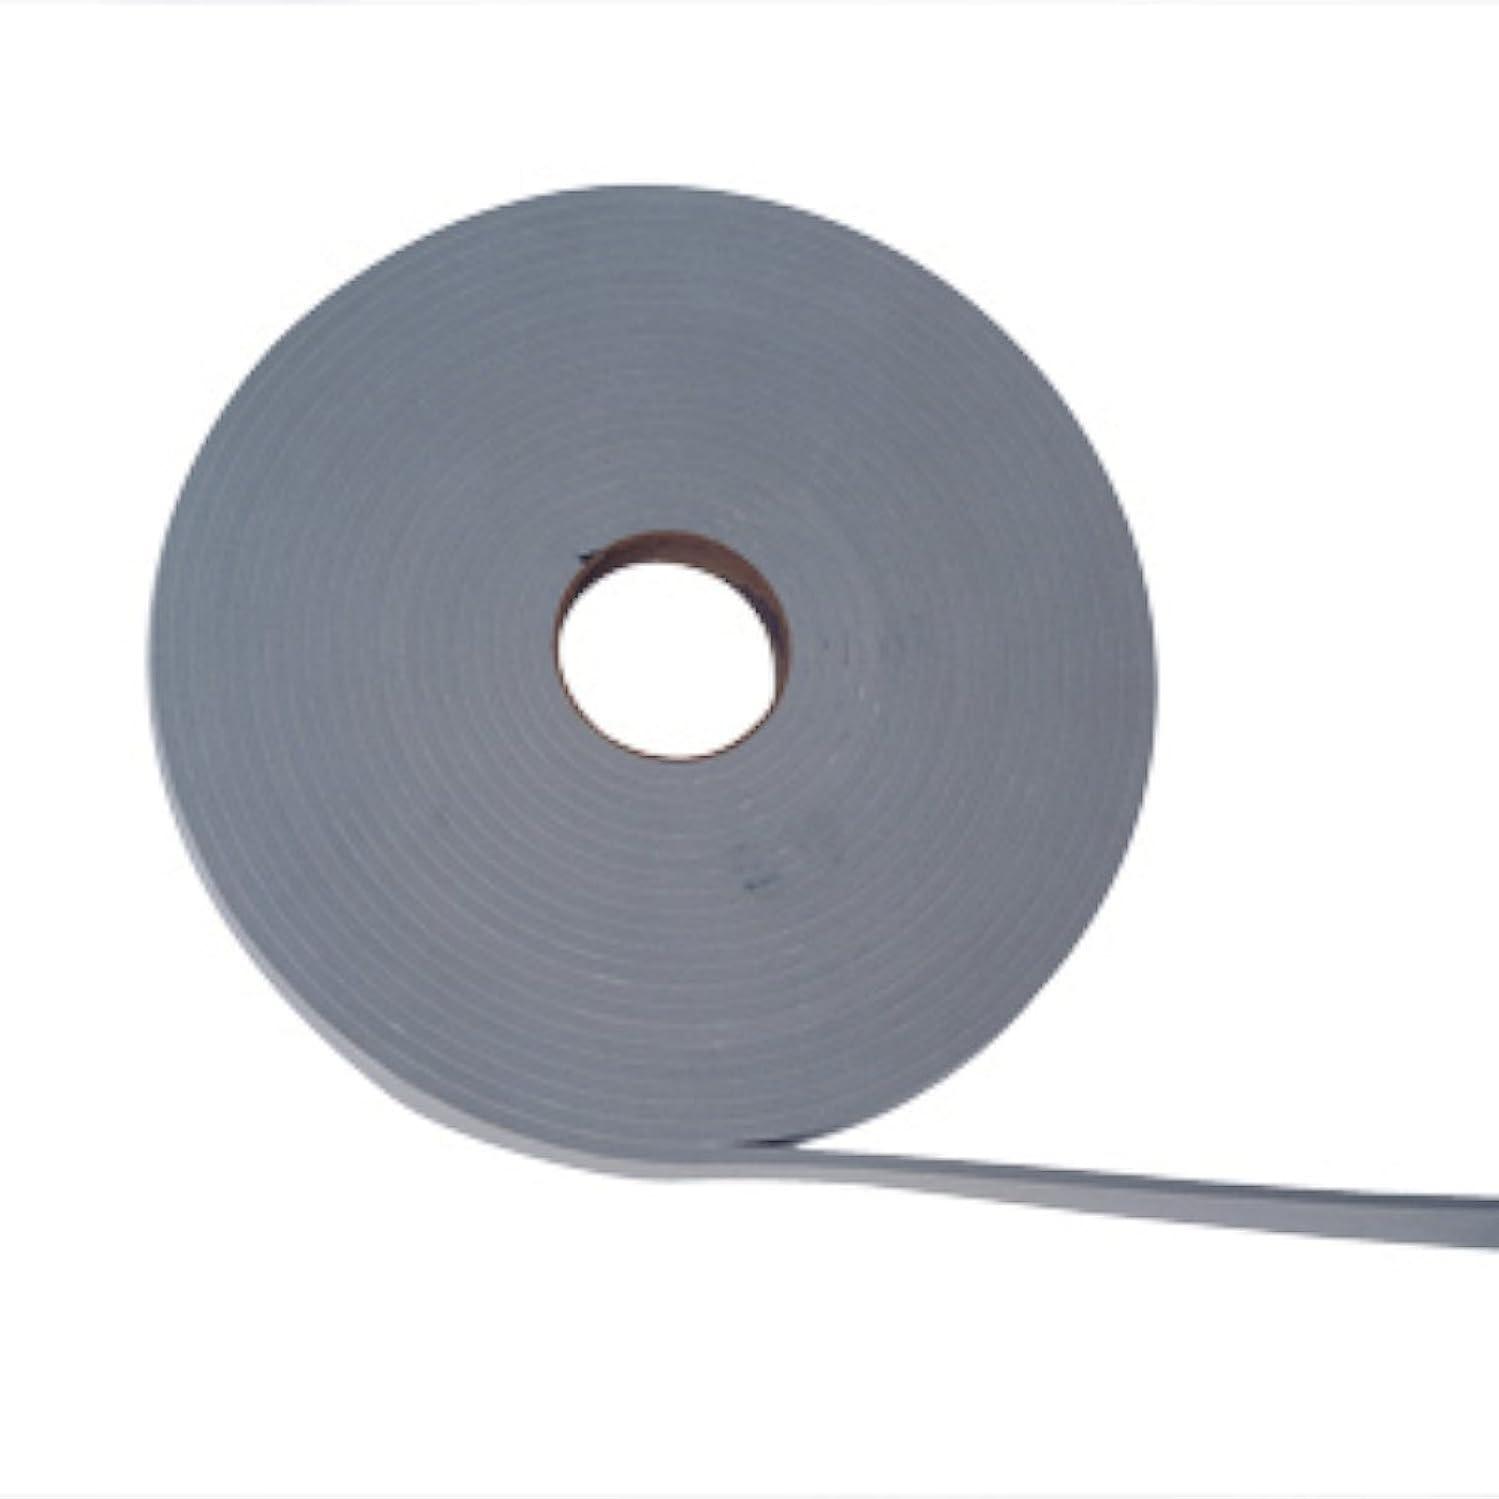 John Latta V7412X15G Foam Tape